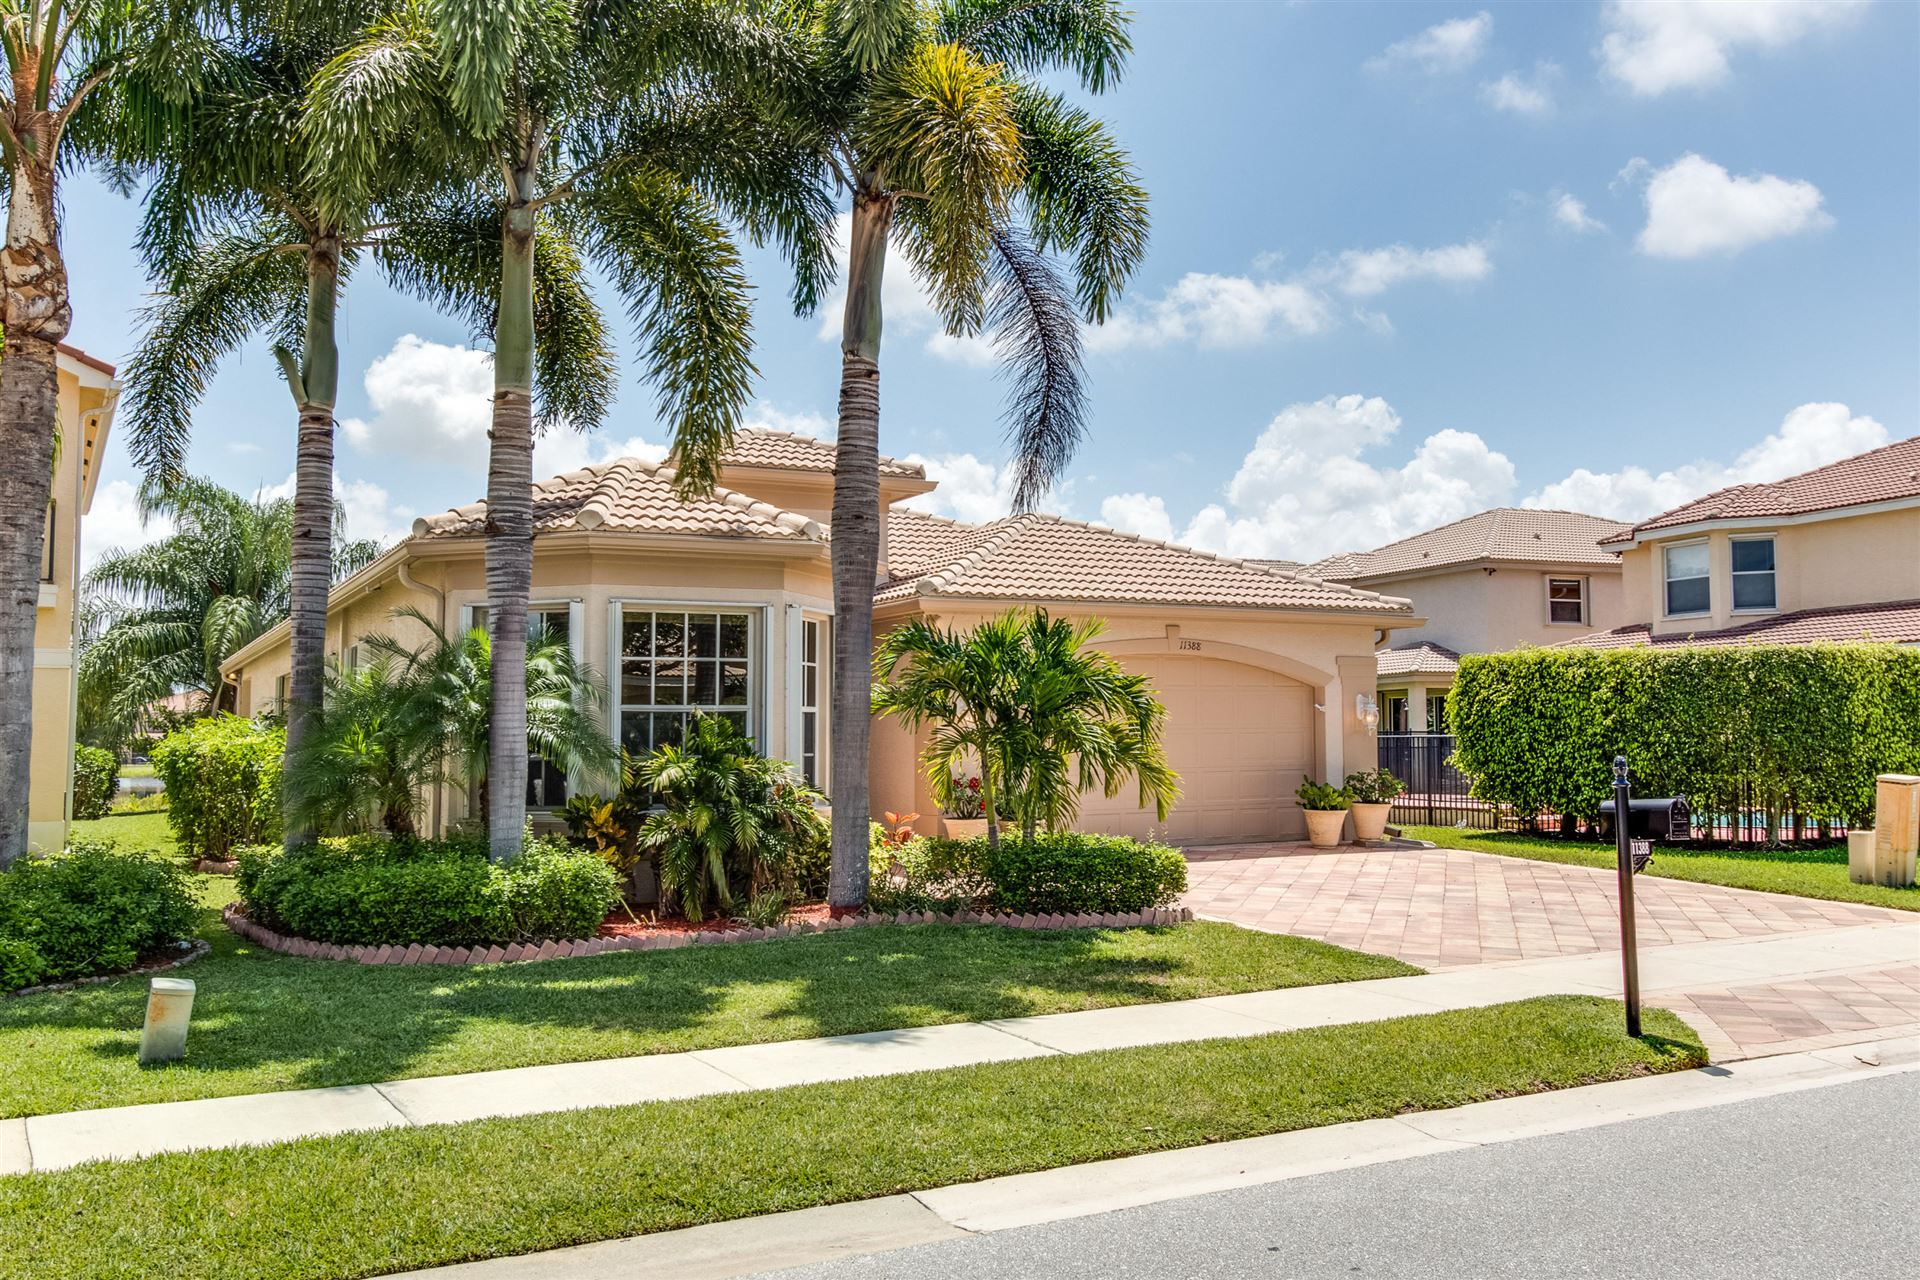 11388 Sandstone Hill Terrace, Boynton Beach, FL 33473 - #: RX-10608309